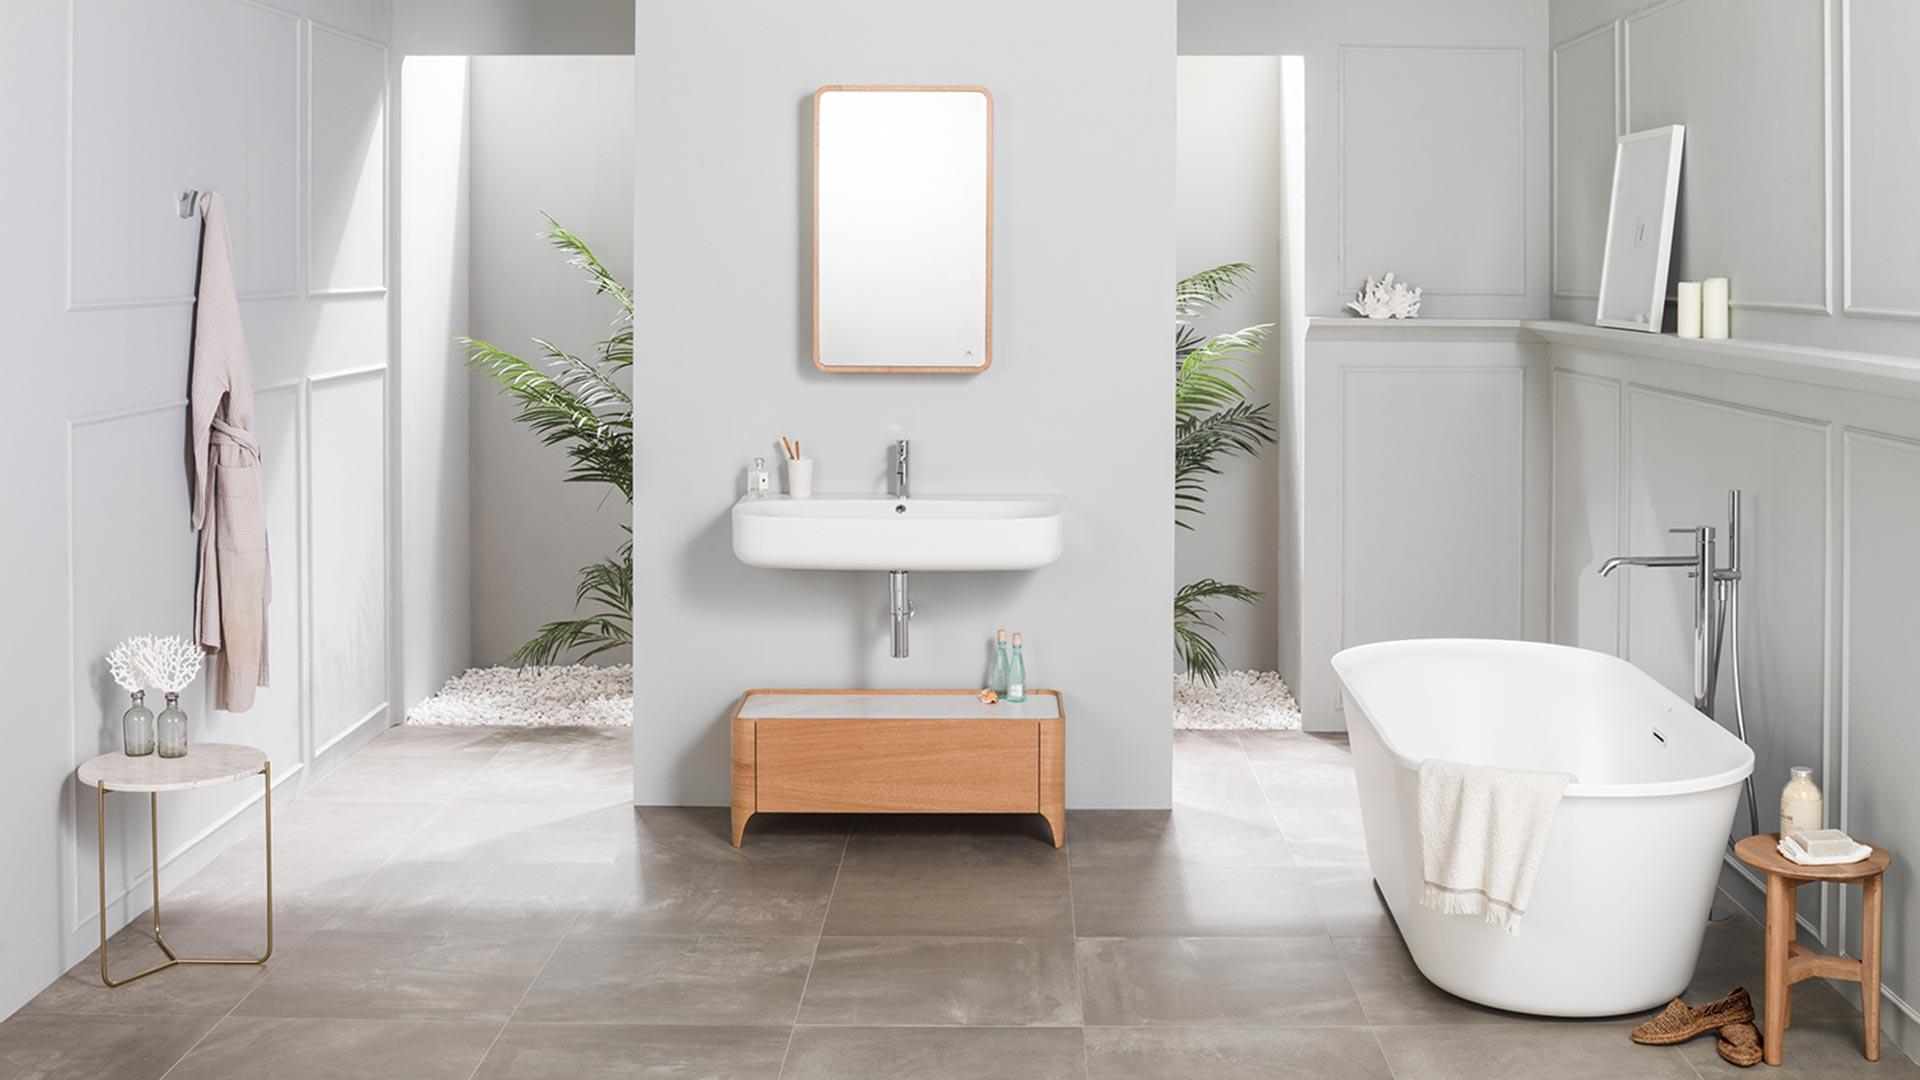 Cersaie 2017 new bathroom furniture nature and frame - Muebles para sanitarios ...